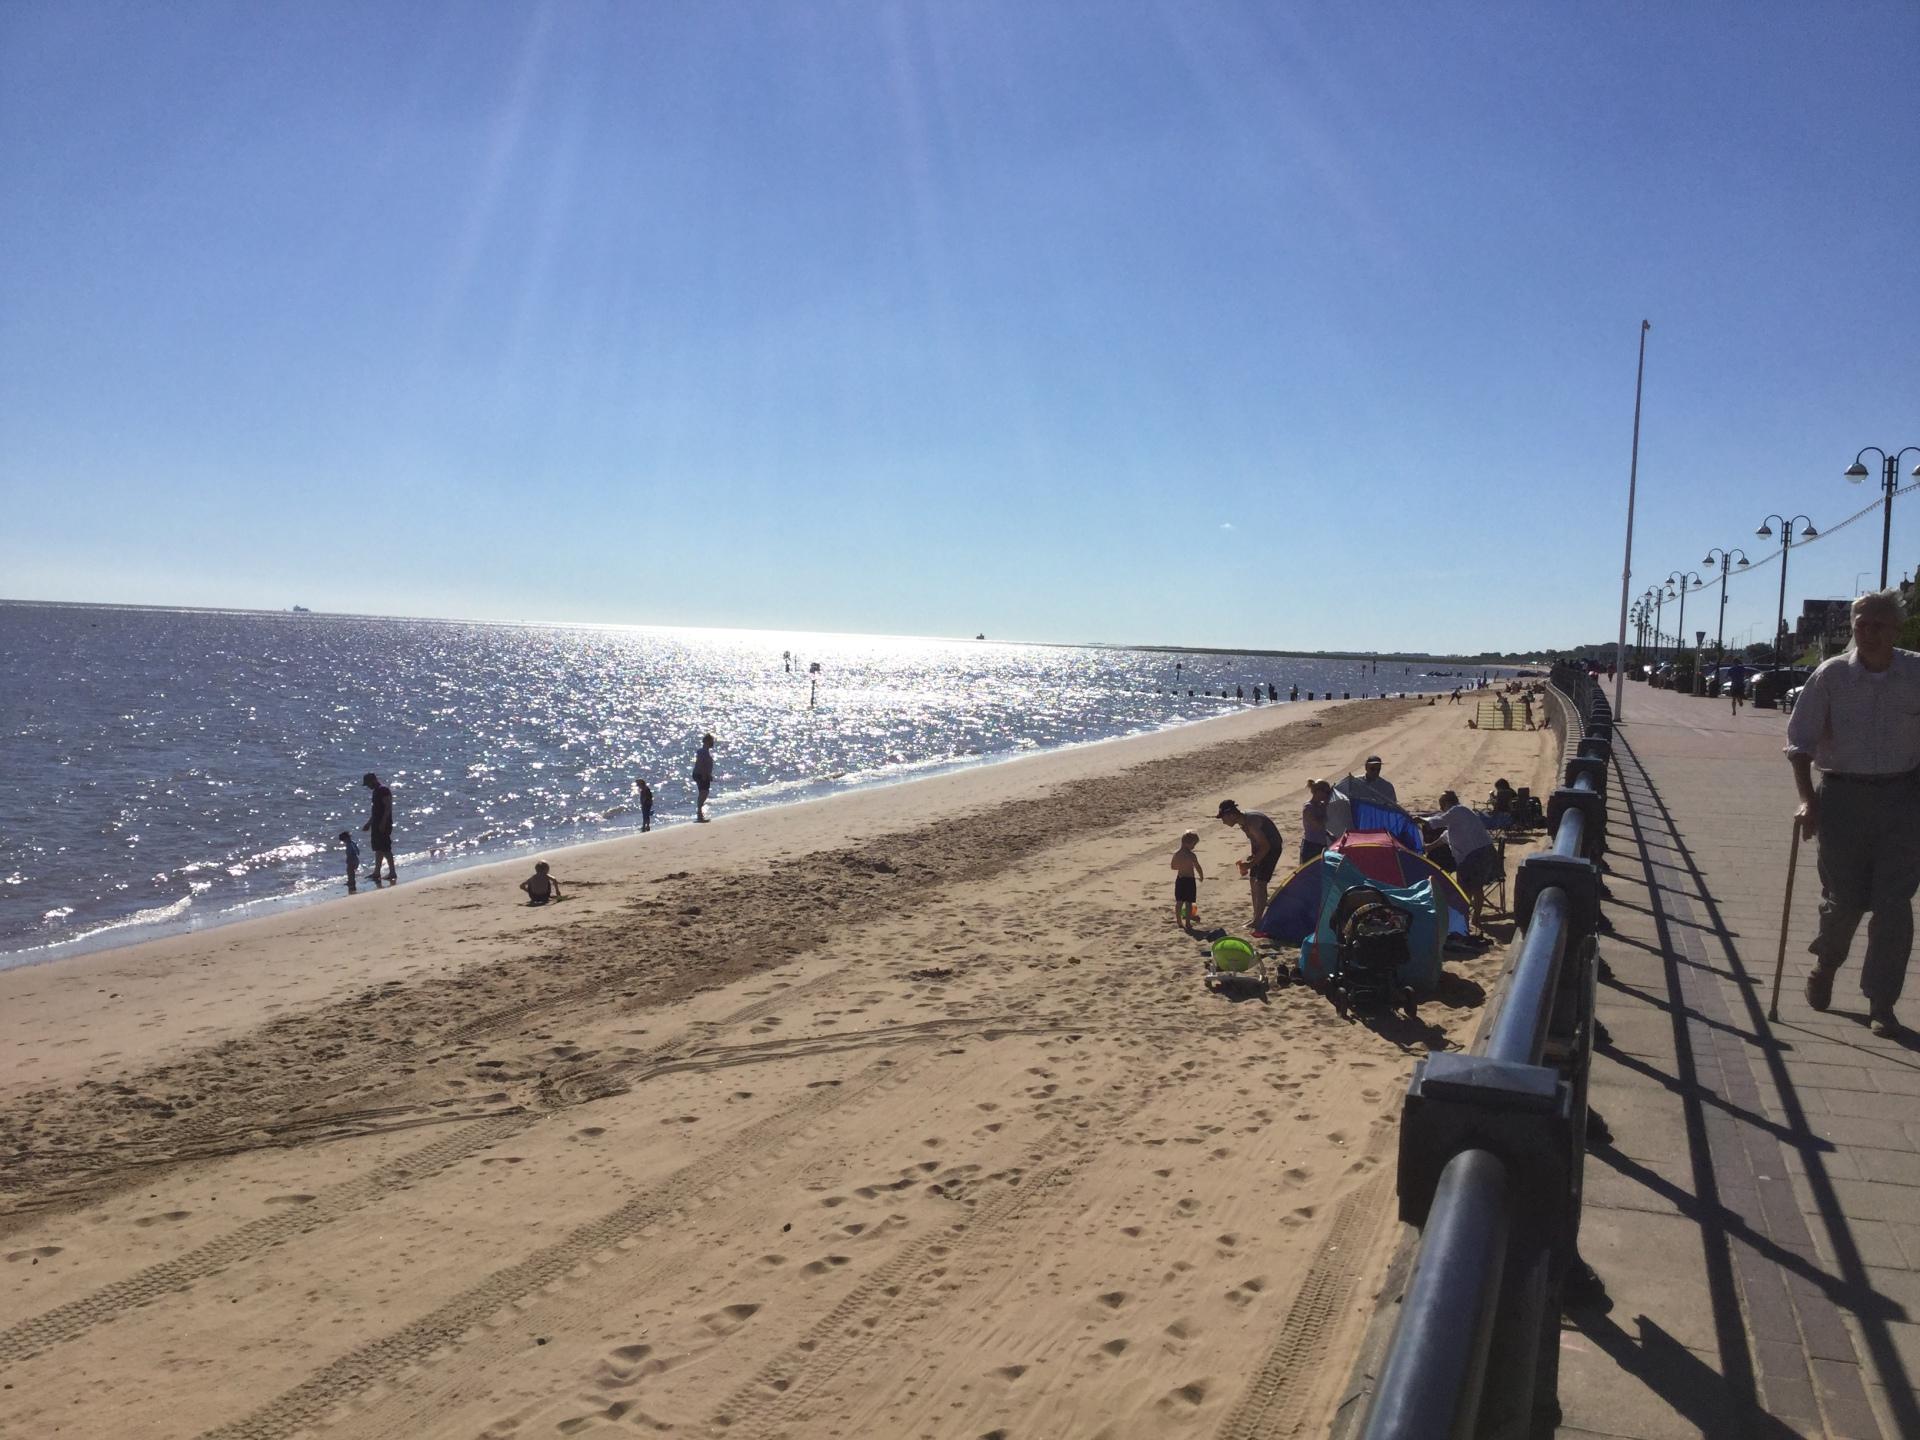 Cleethorpes Beaches